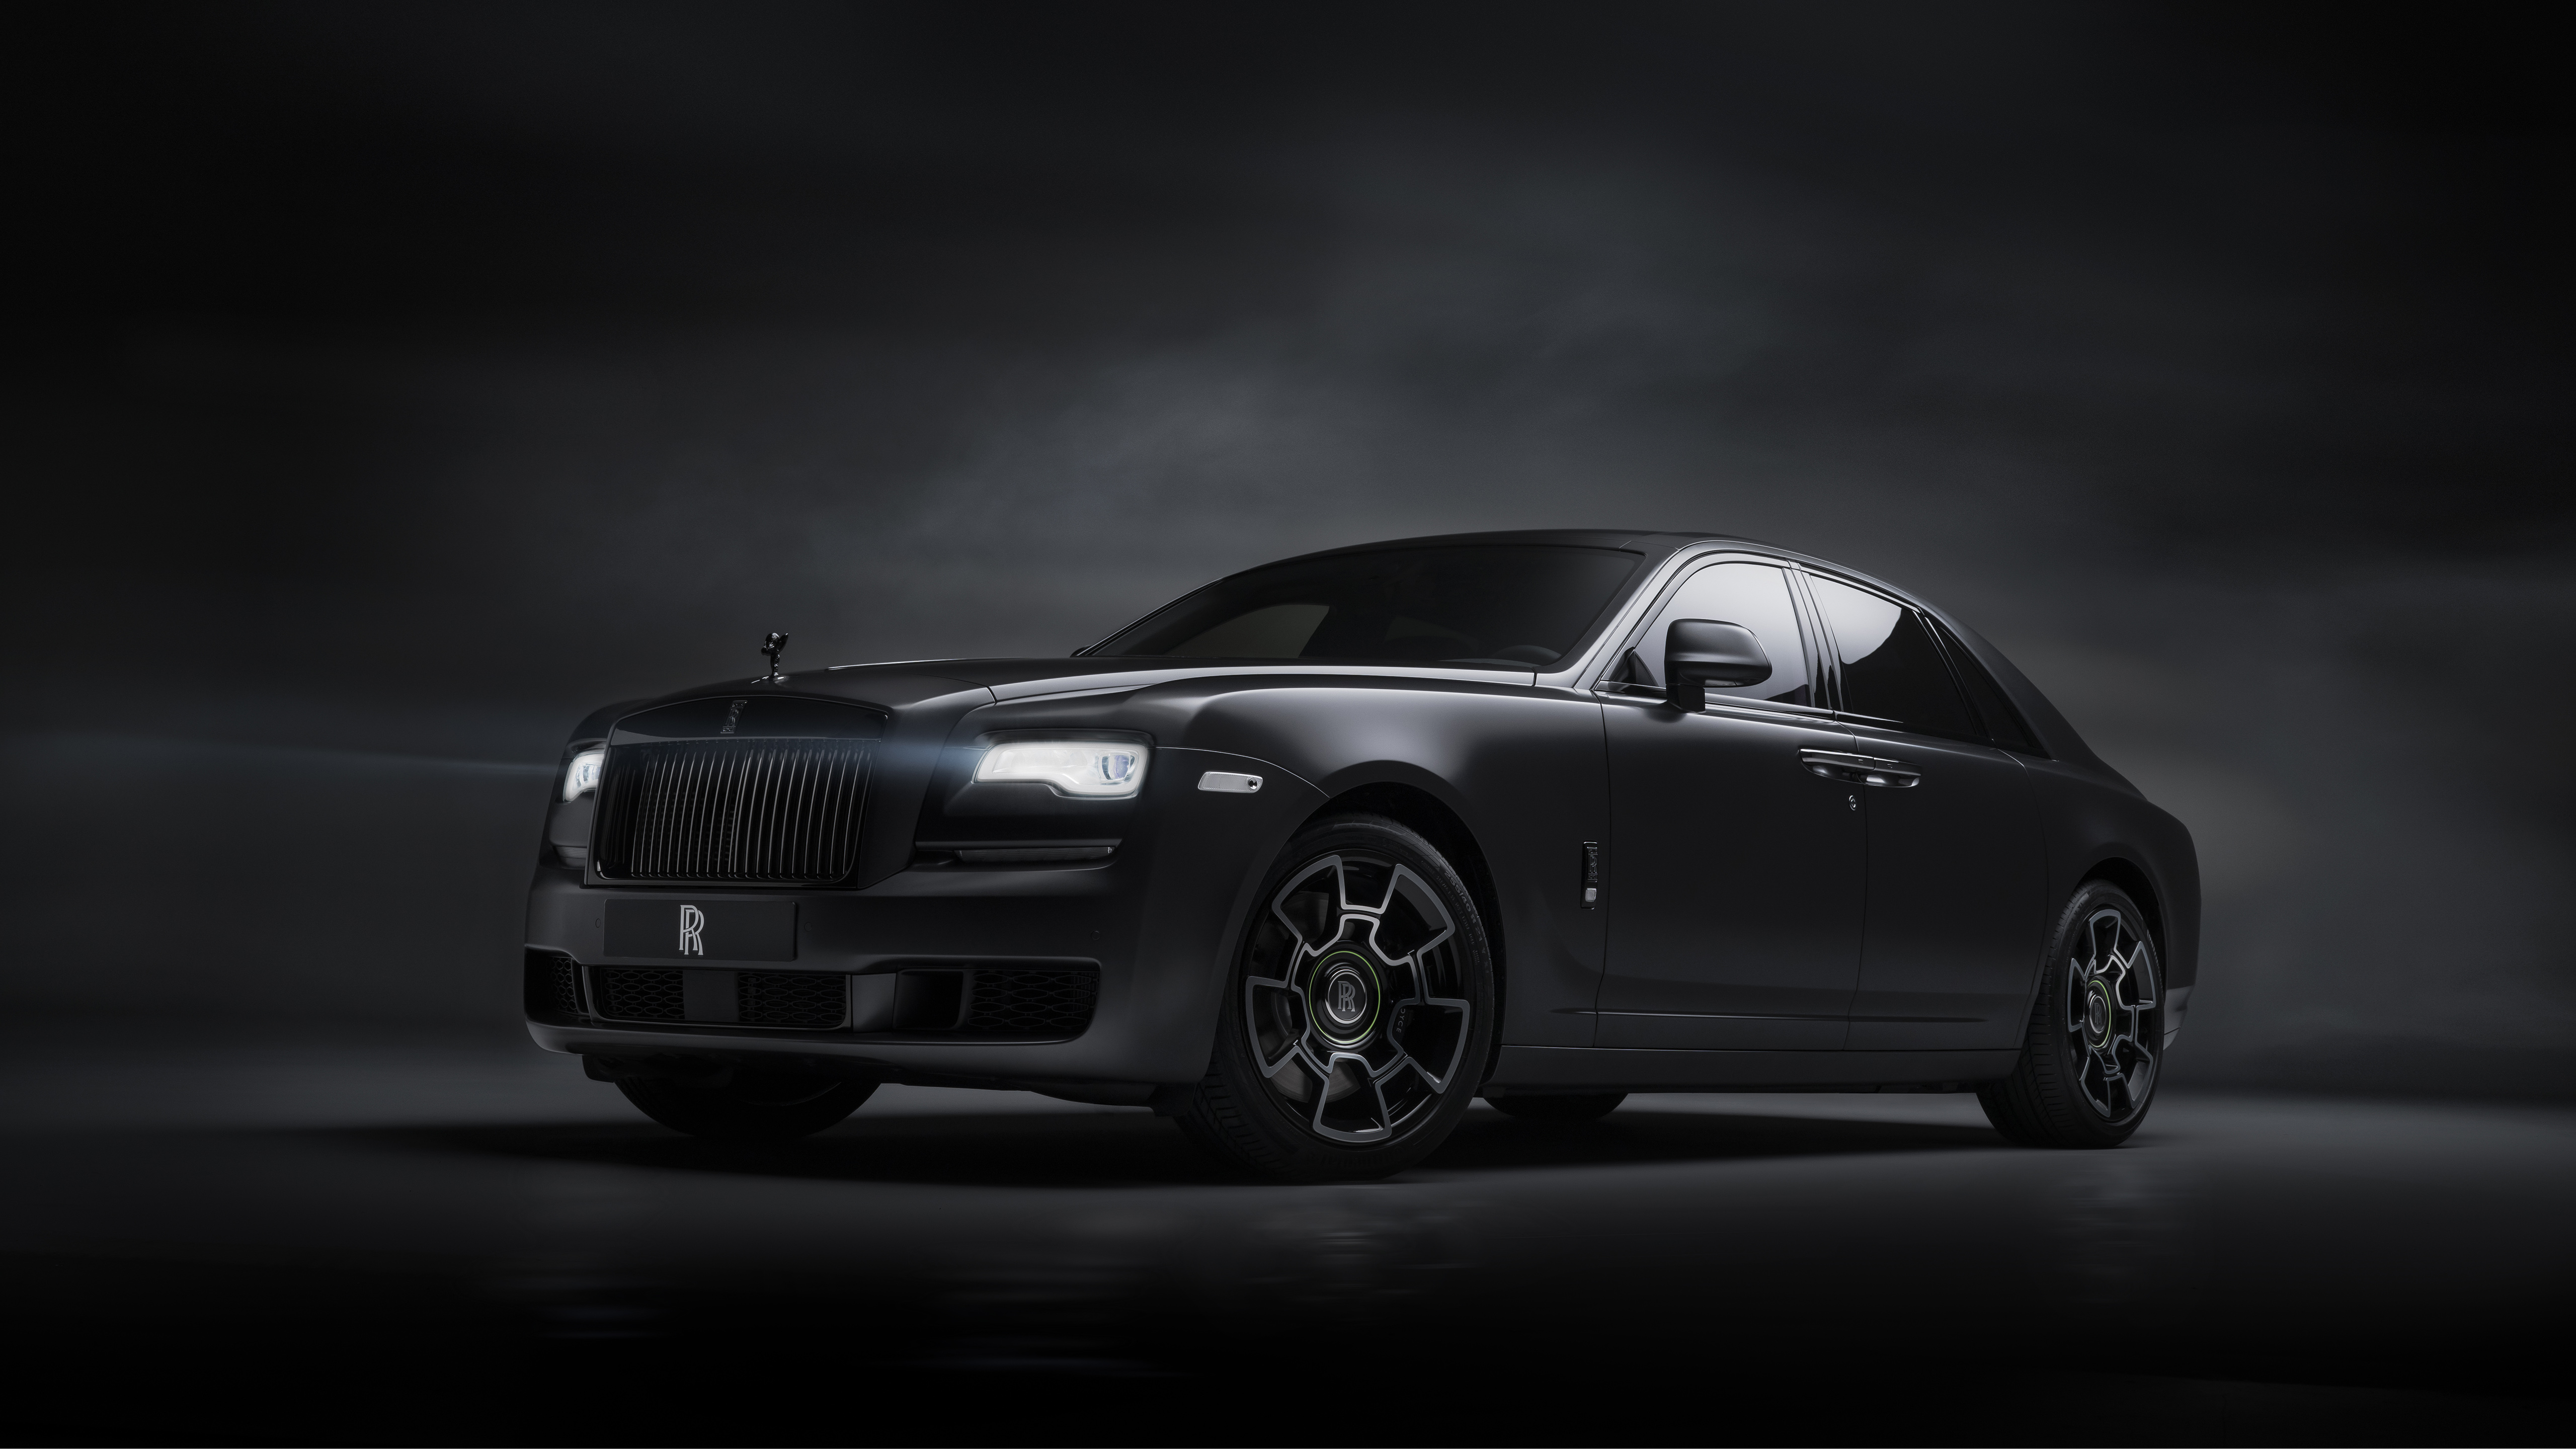 Rolls Royce Ghost Black Badge 2019 5k Wallpaper Hd Car Wallpapers Id 12276